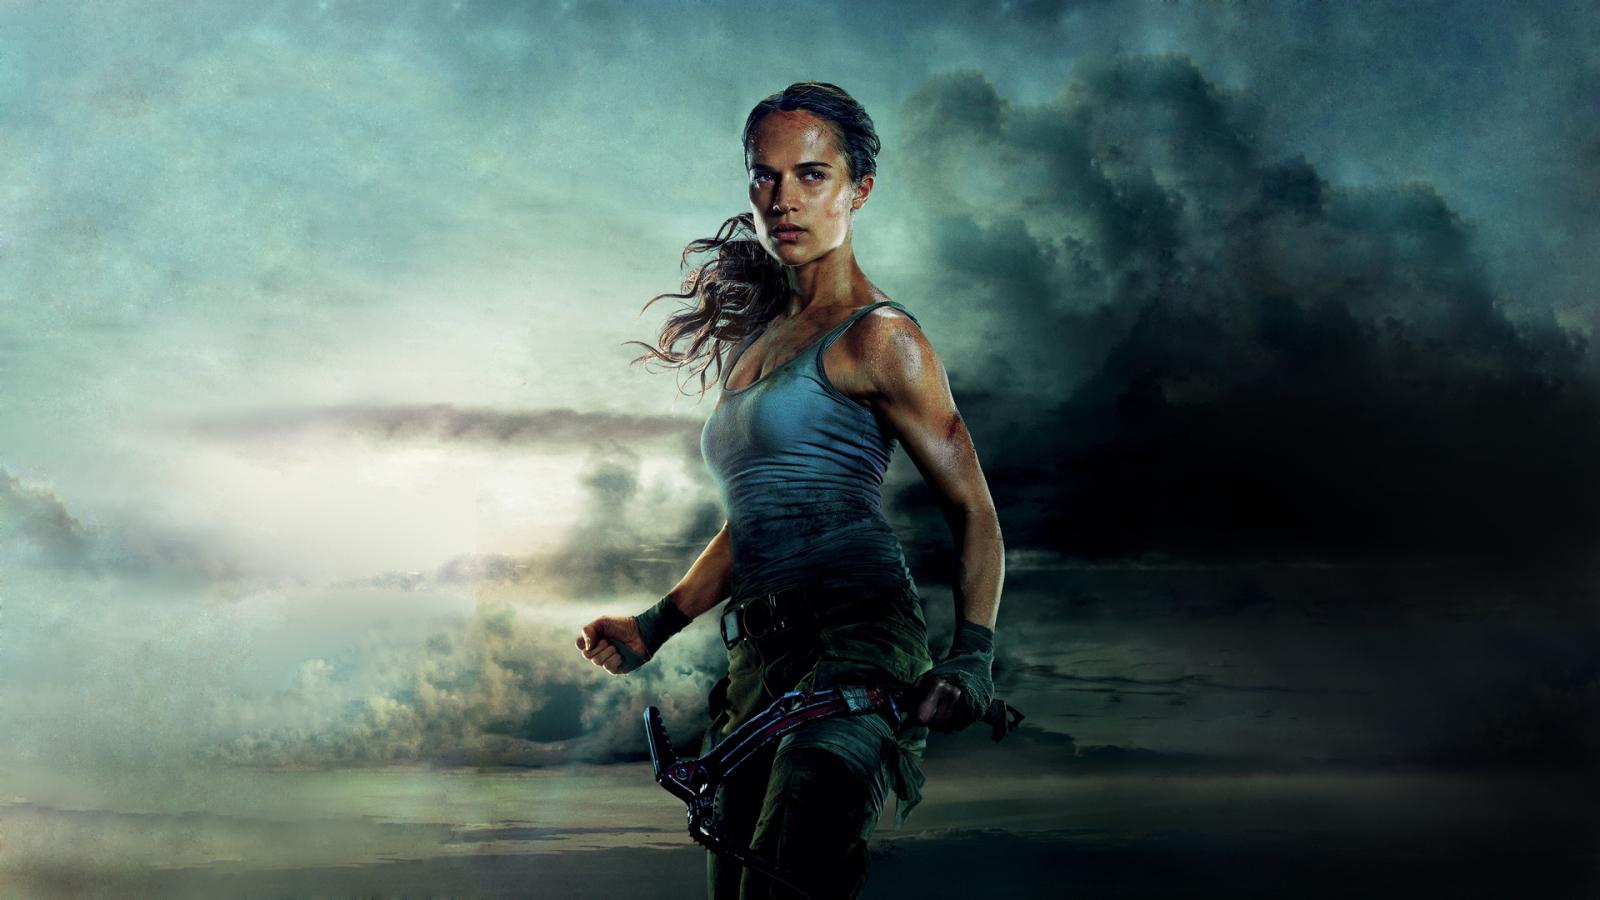 Download Alicia Vikander Tomb Raider 2018 Movie 1152x864 ...